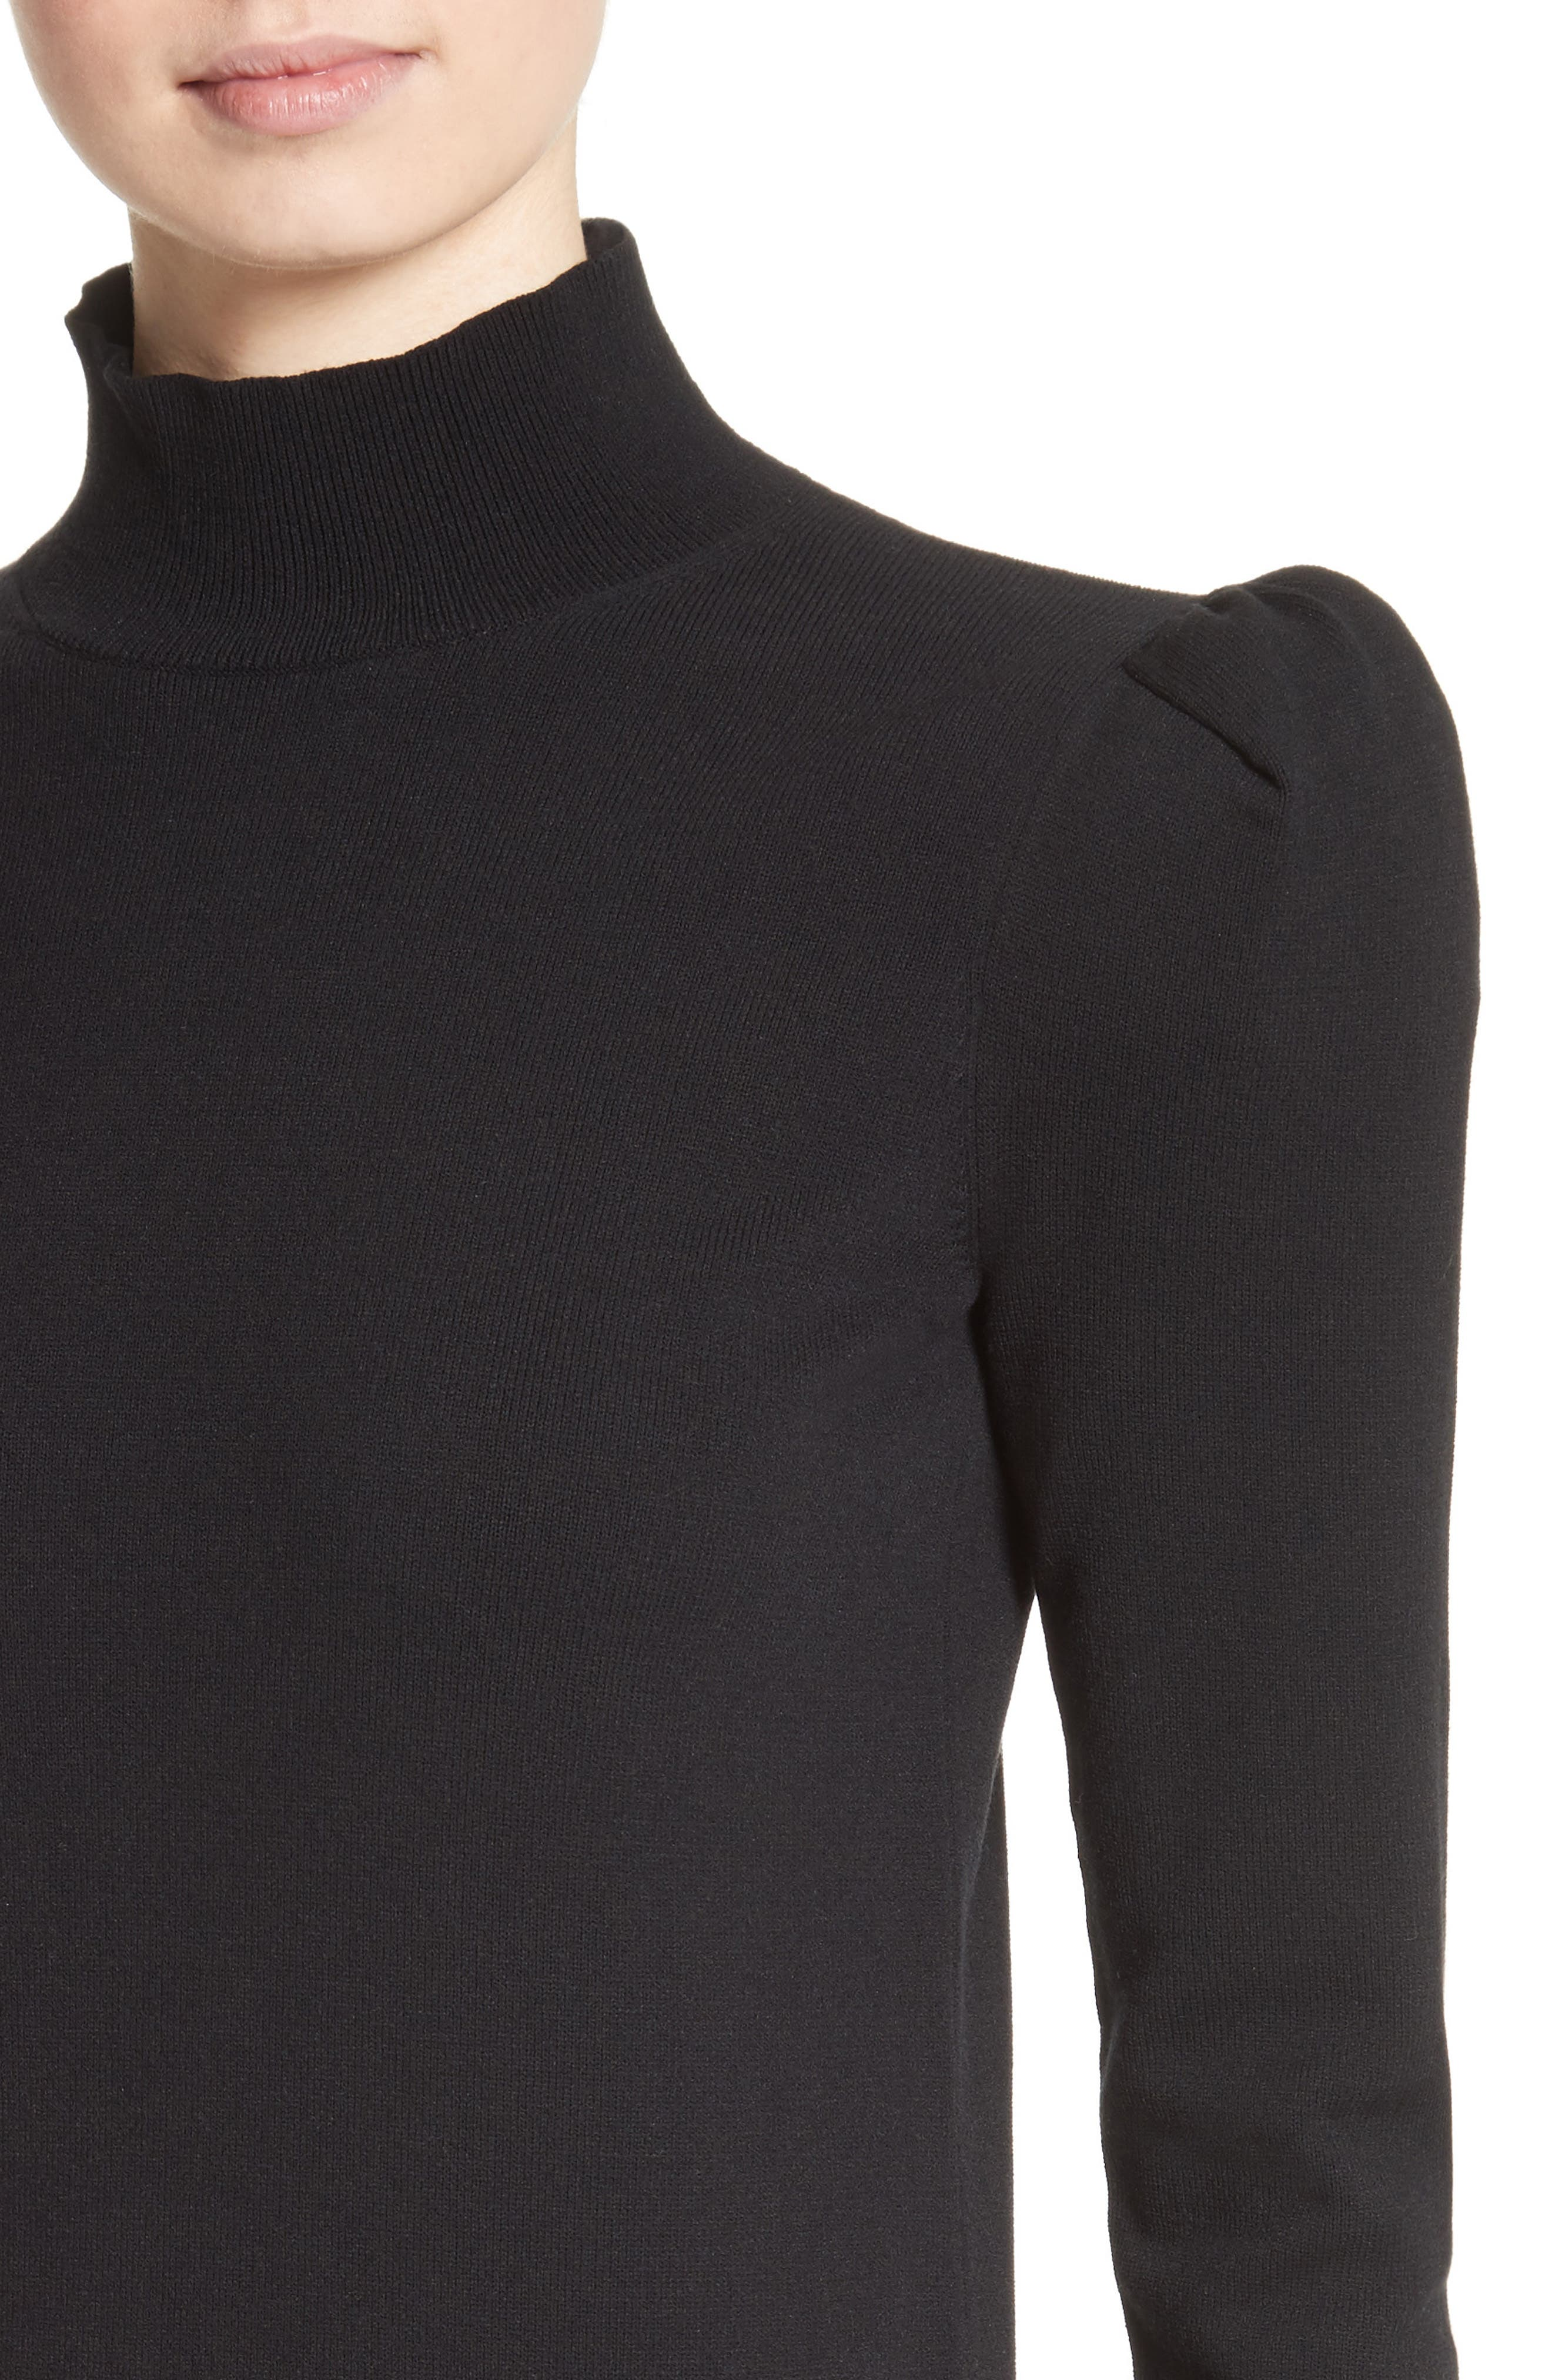 Cashmere Puff Shoulder Turtleneck Sweater,                             Alternate thumbnail 4, color,                             001